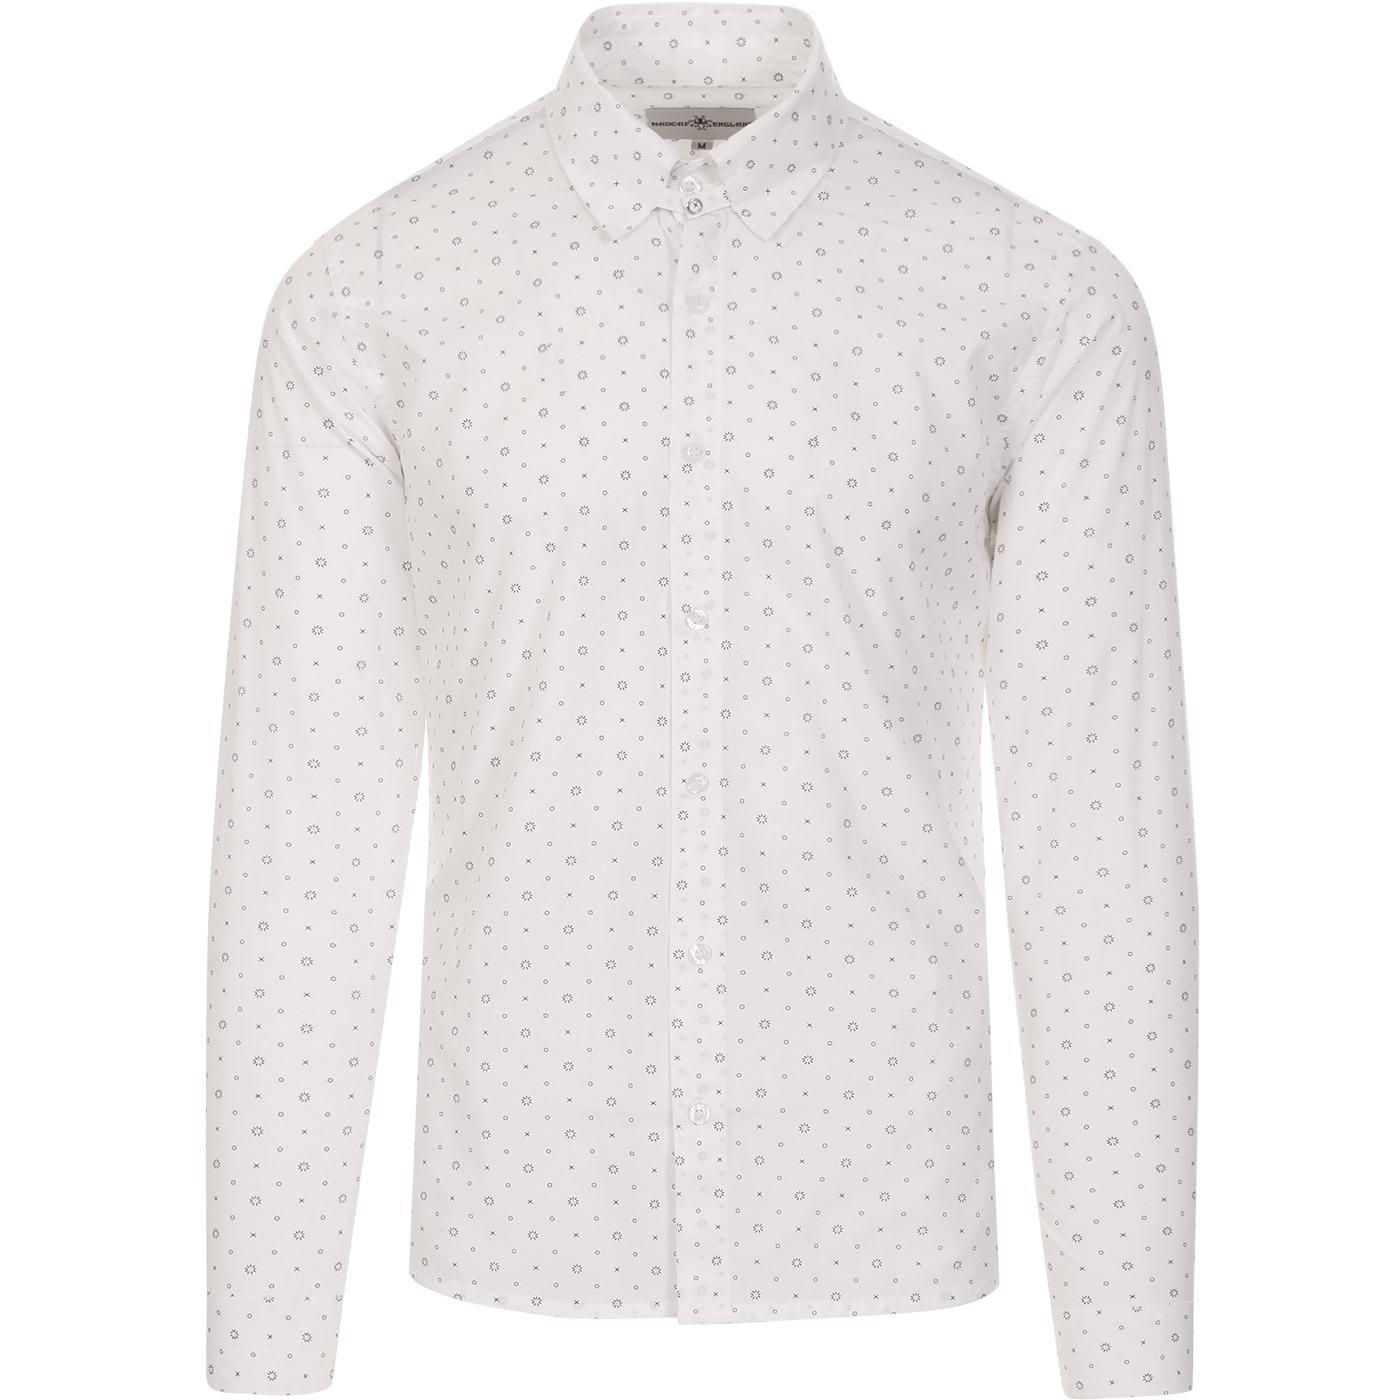 Byron MADCAP ENGLAND 60s Mod Tab Collar Shirt (W)